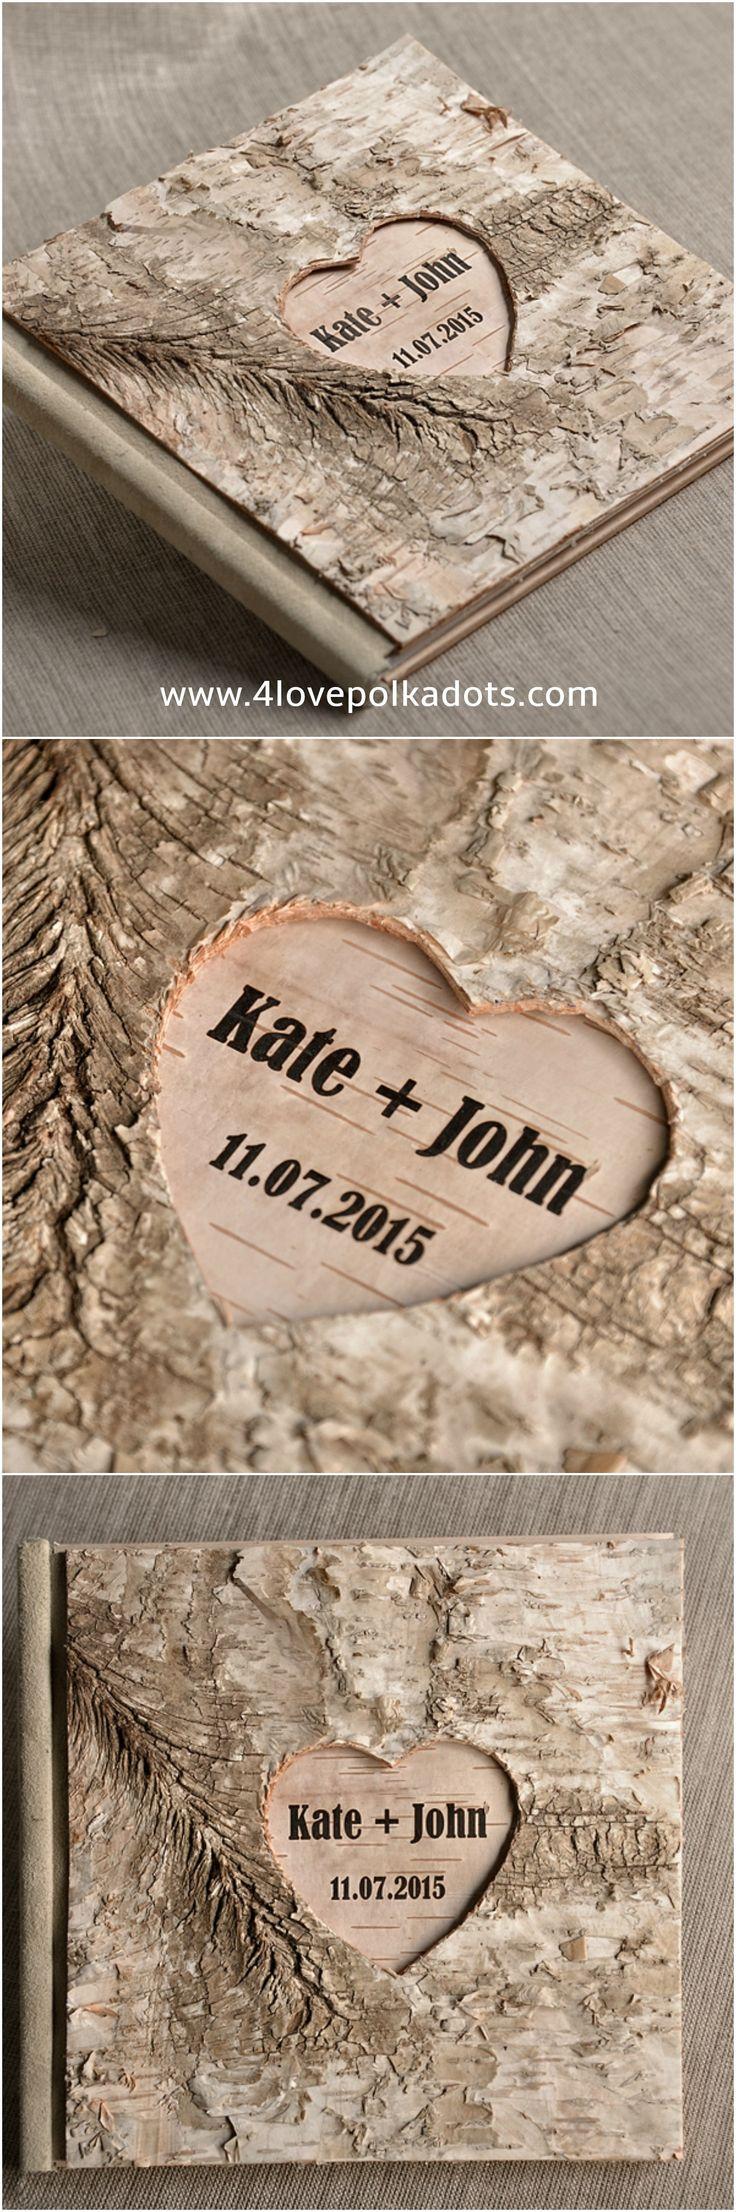 Wooden #guestbook #4lovepolkadots #weddingguestbook #guestbookrustic #rusticguestbook